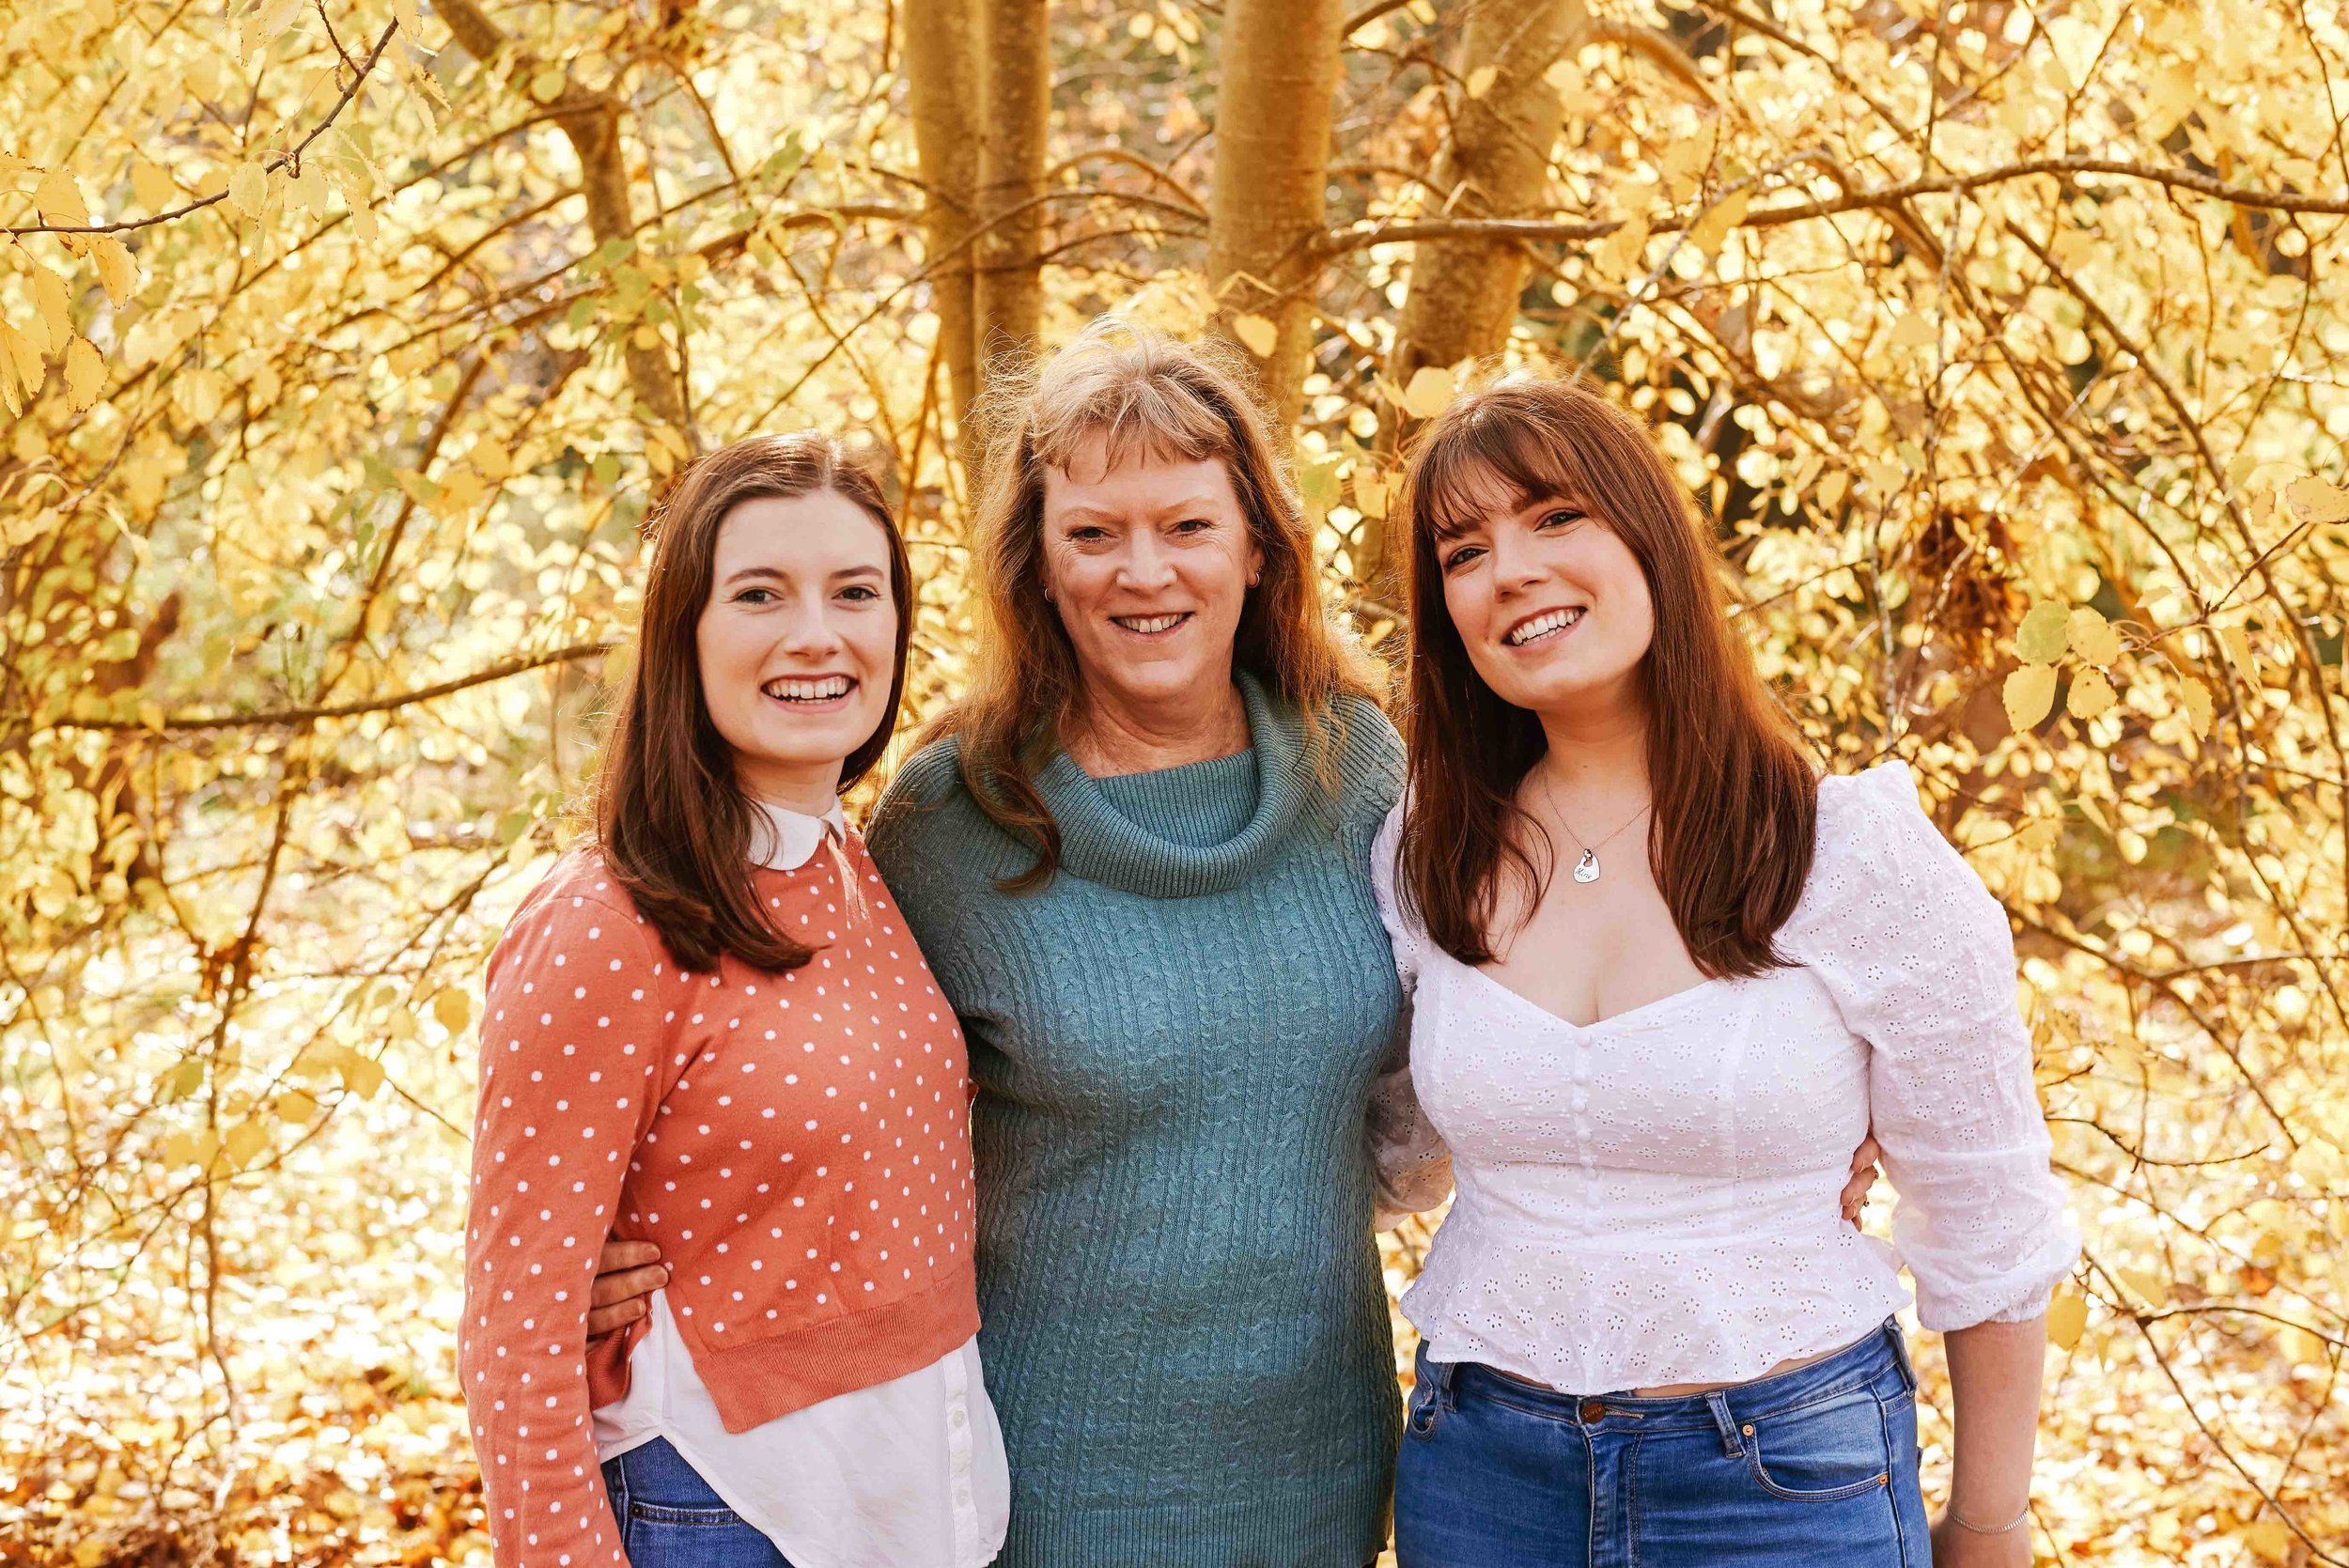 mornington-peninsula-family-photographer-marissa-jade-photography-families-red-hill-1.jpg